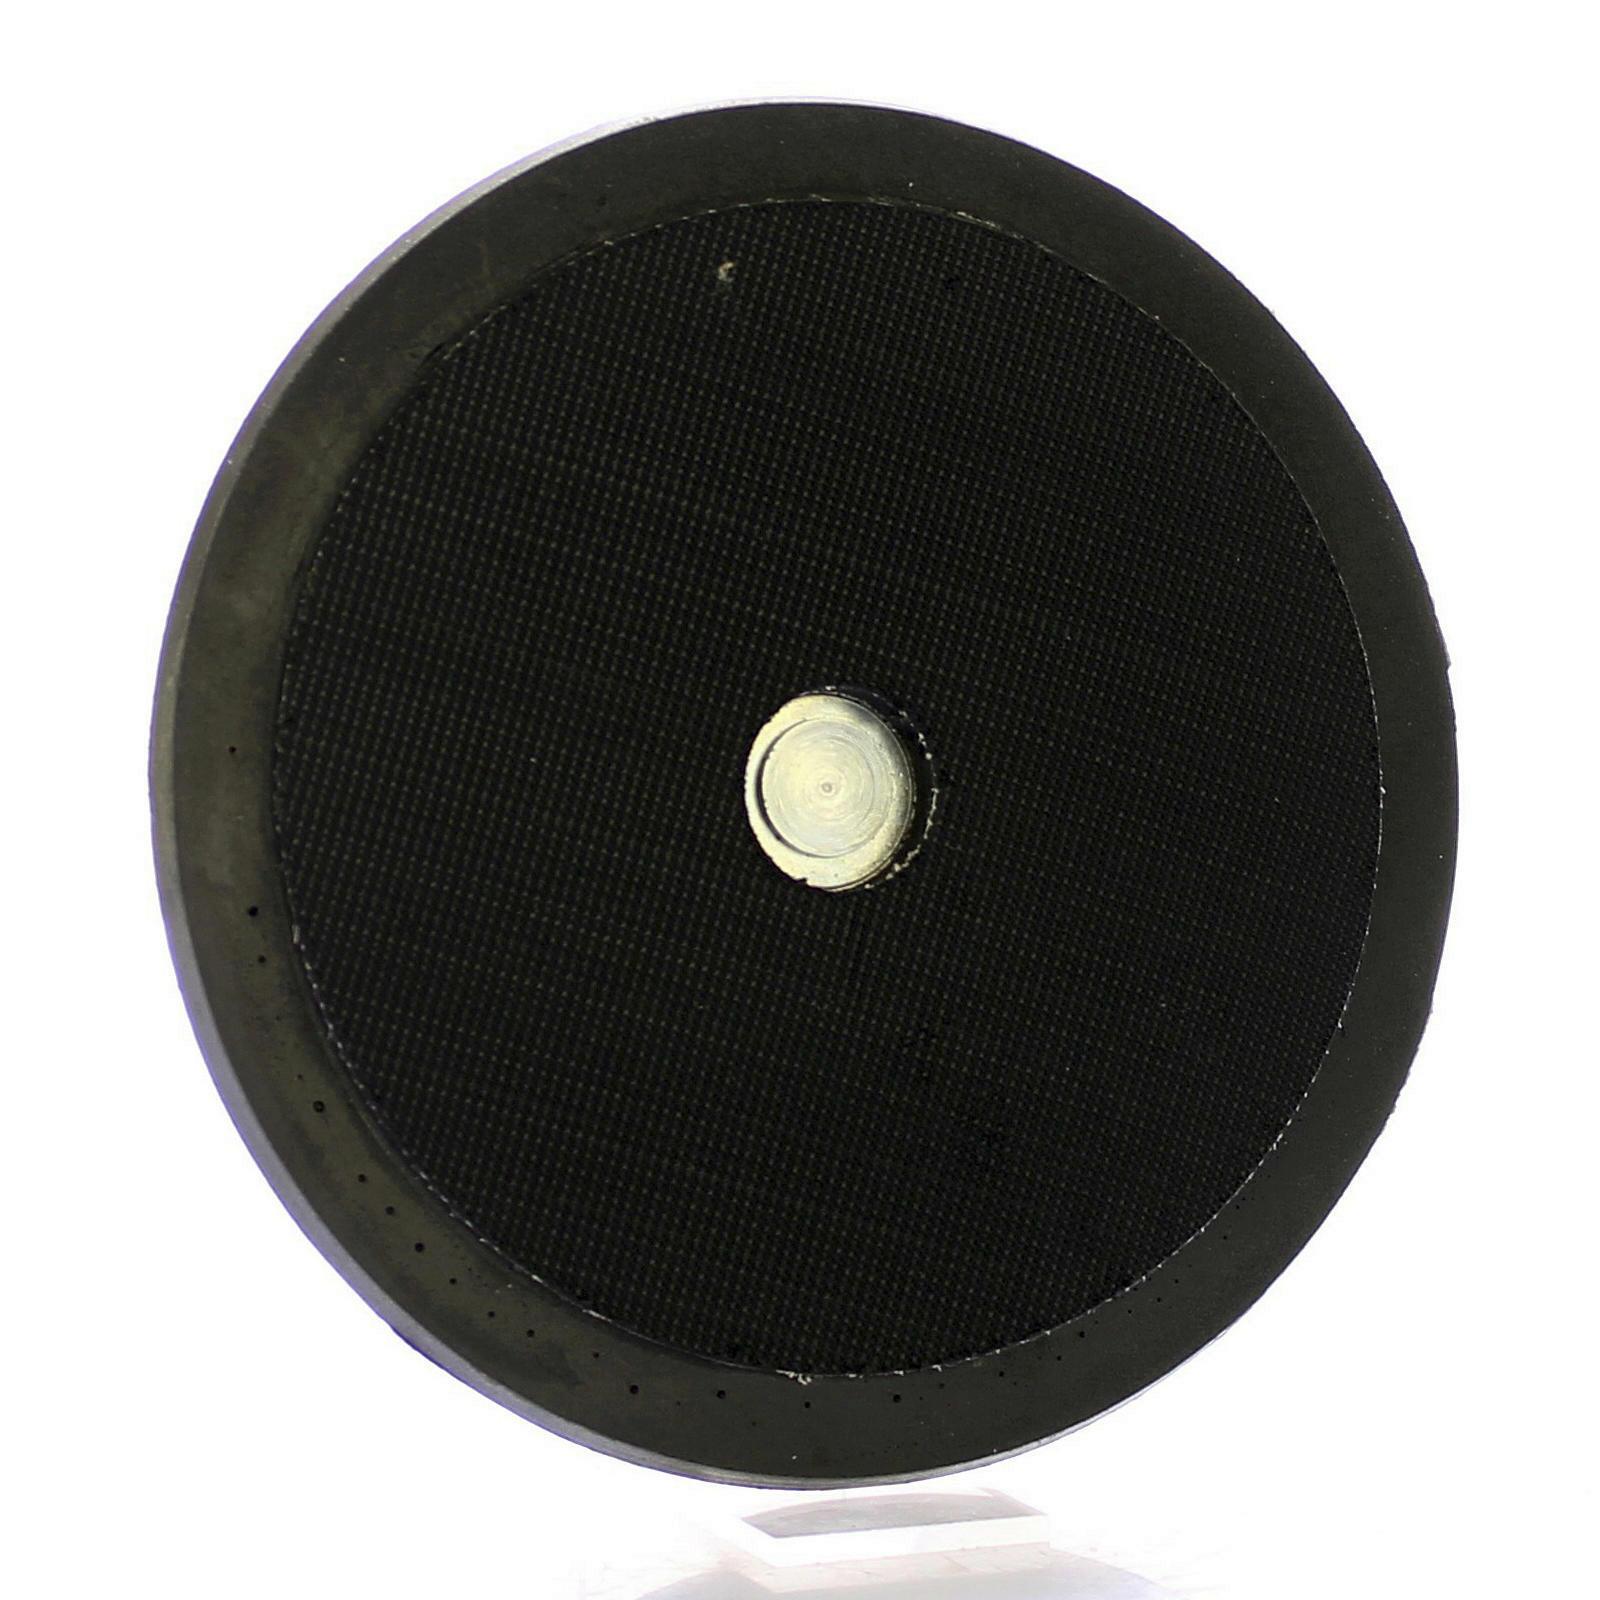 Meguiars DA Polisher Backing Plate Polierplatte